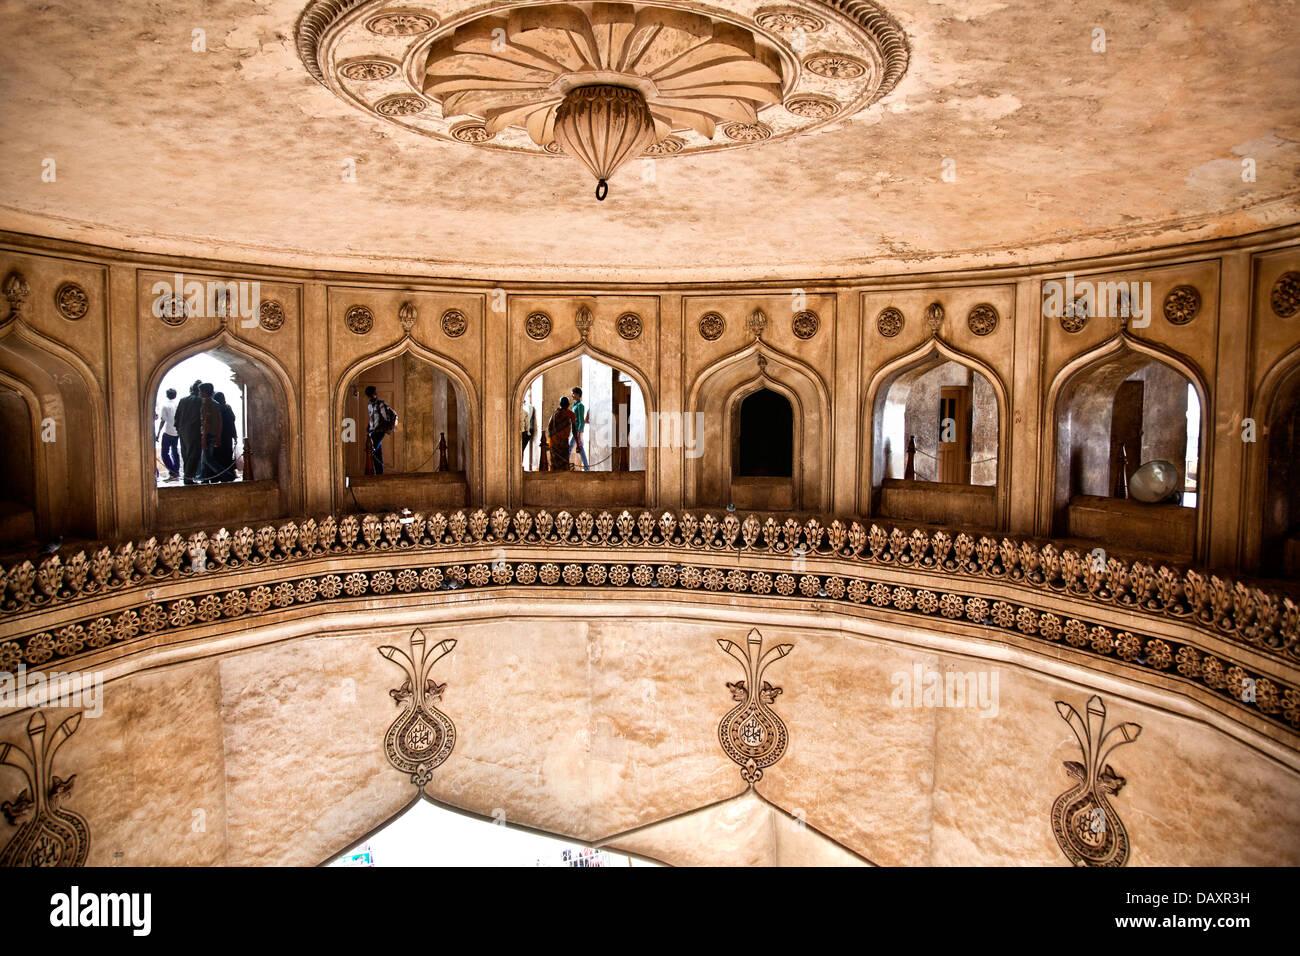 Interno del Charminar, Charminar, Hyderabad, Andhra Pradesh, India Immagini Stock